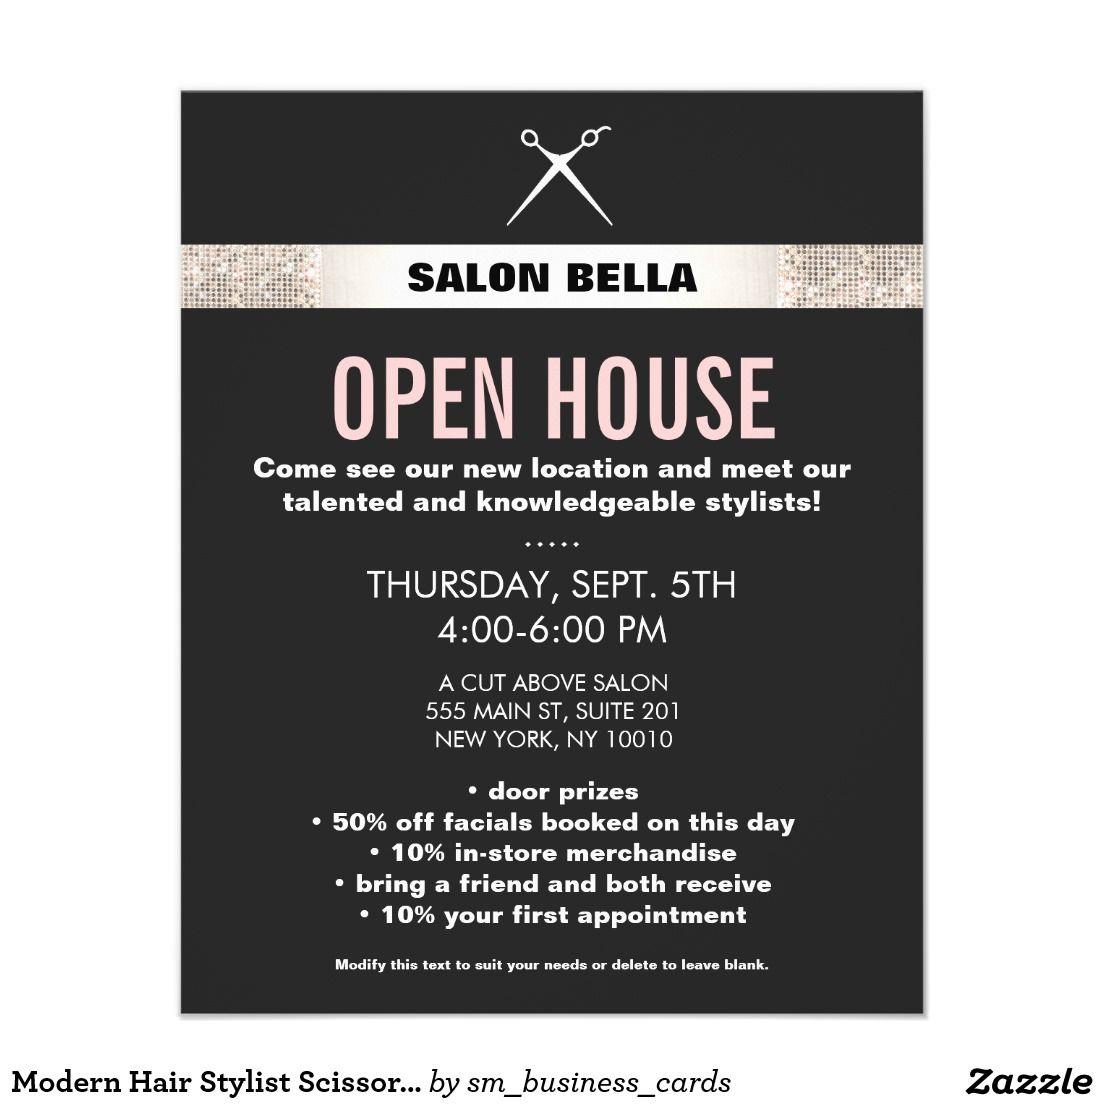 Modern Hair Stylist Scissors Silver Sequins Salon Flyer Zazzle